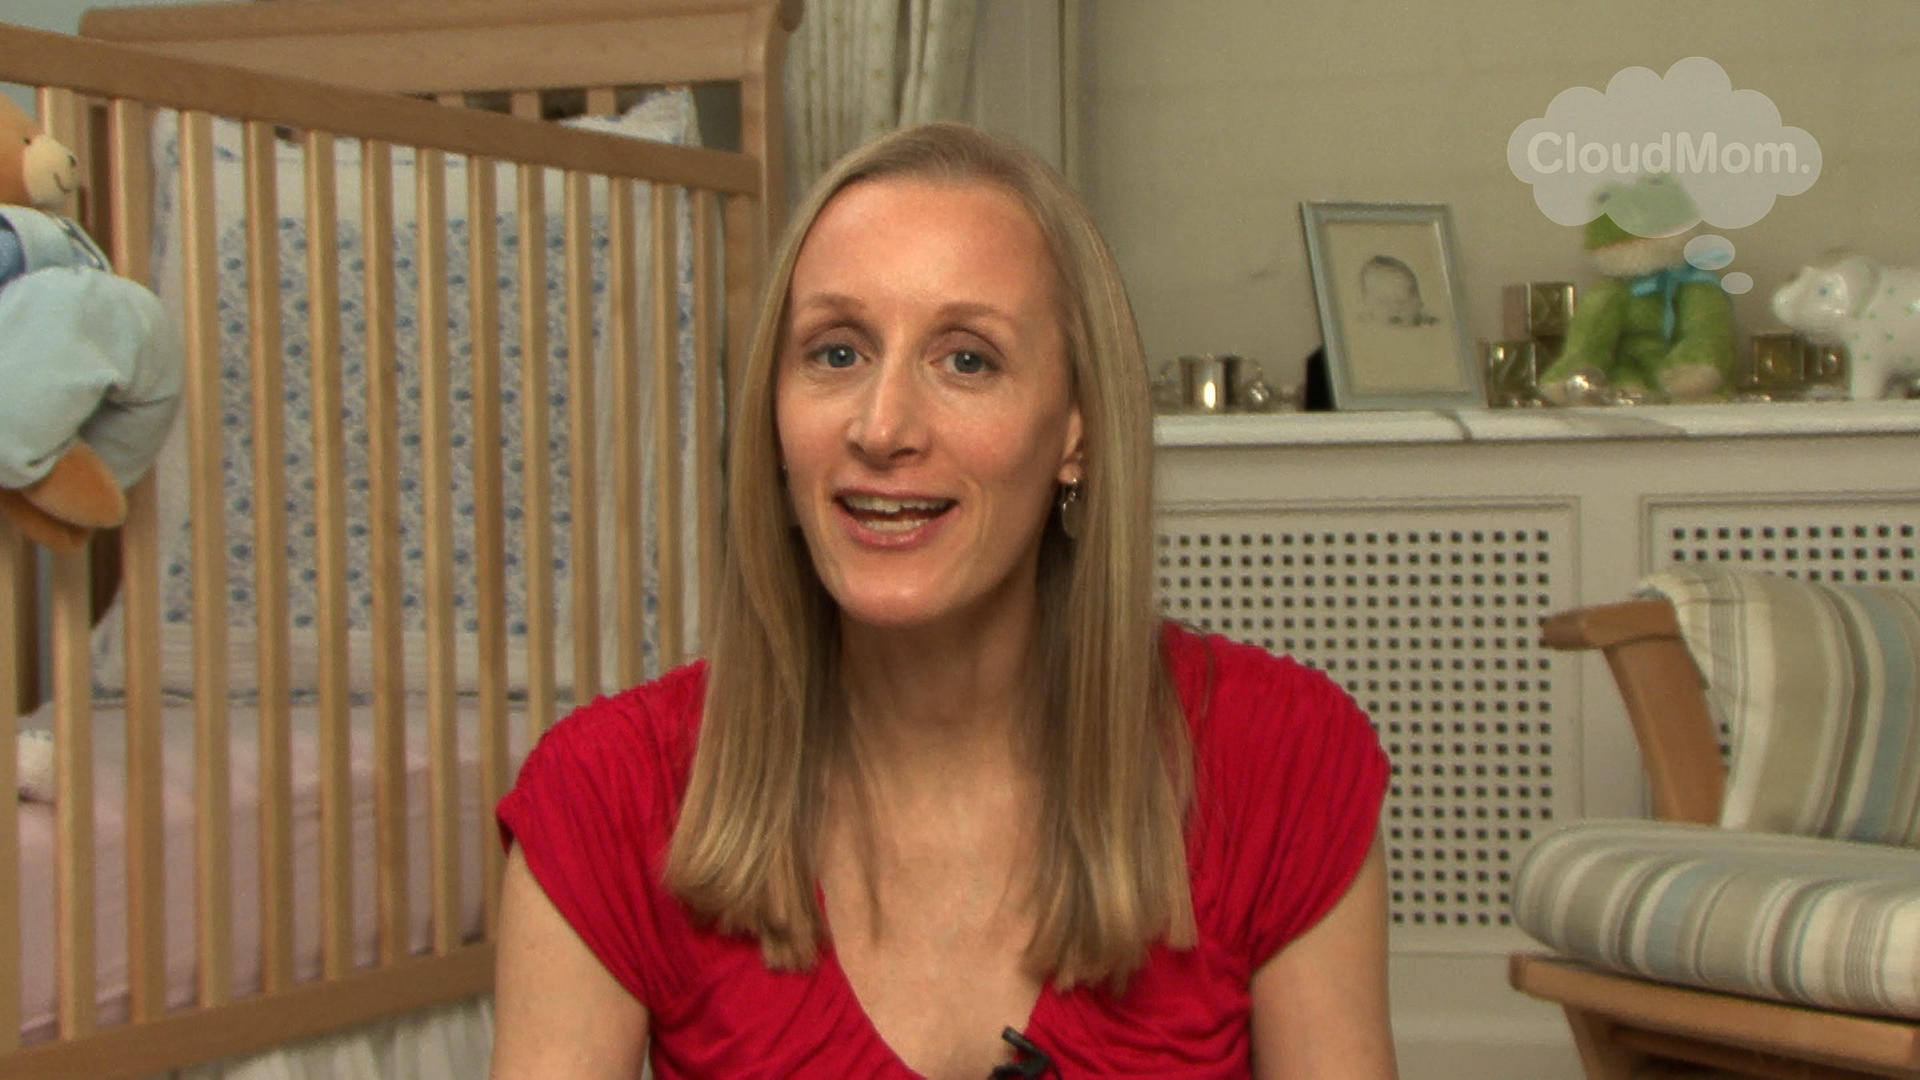 Breastfed Baby Schedule: 4-6 Months